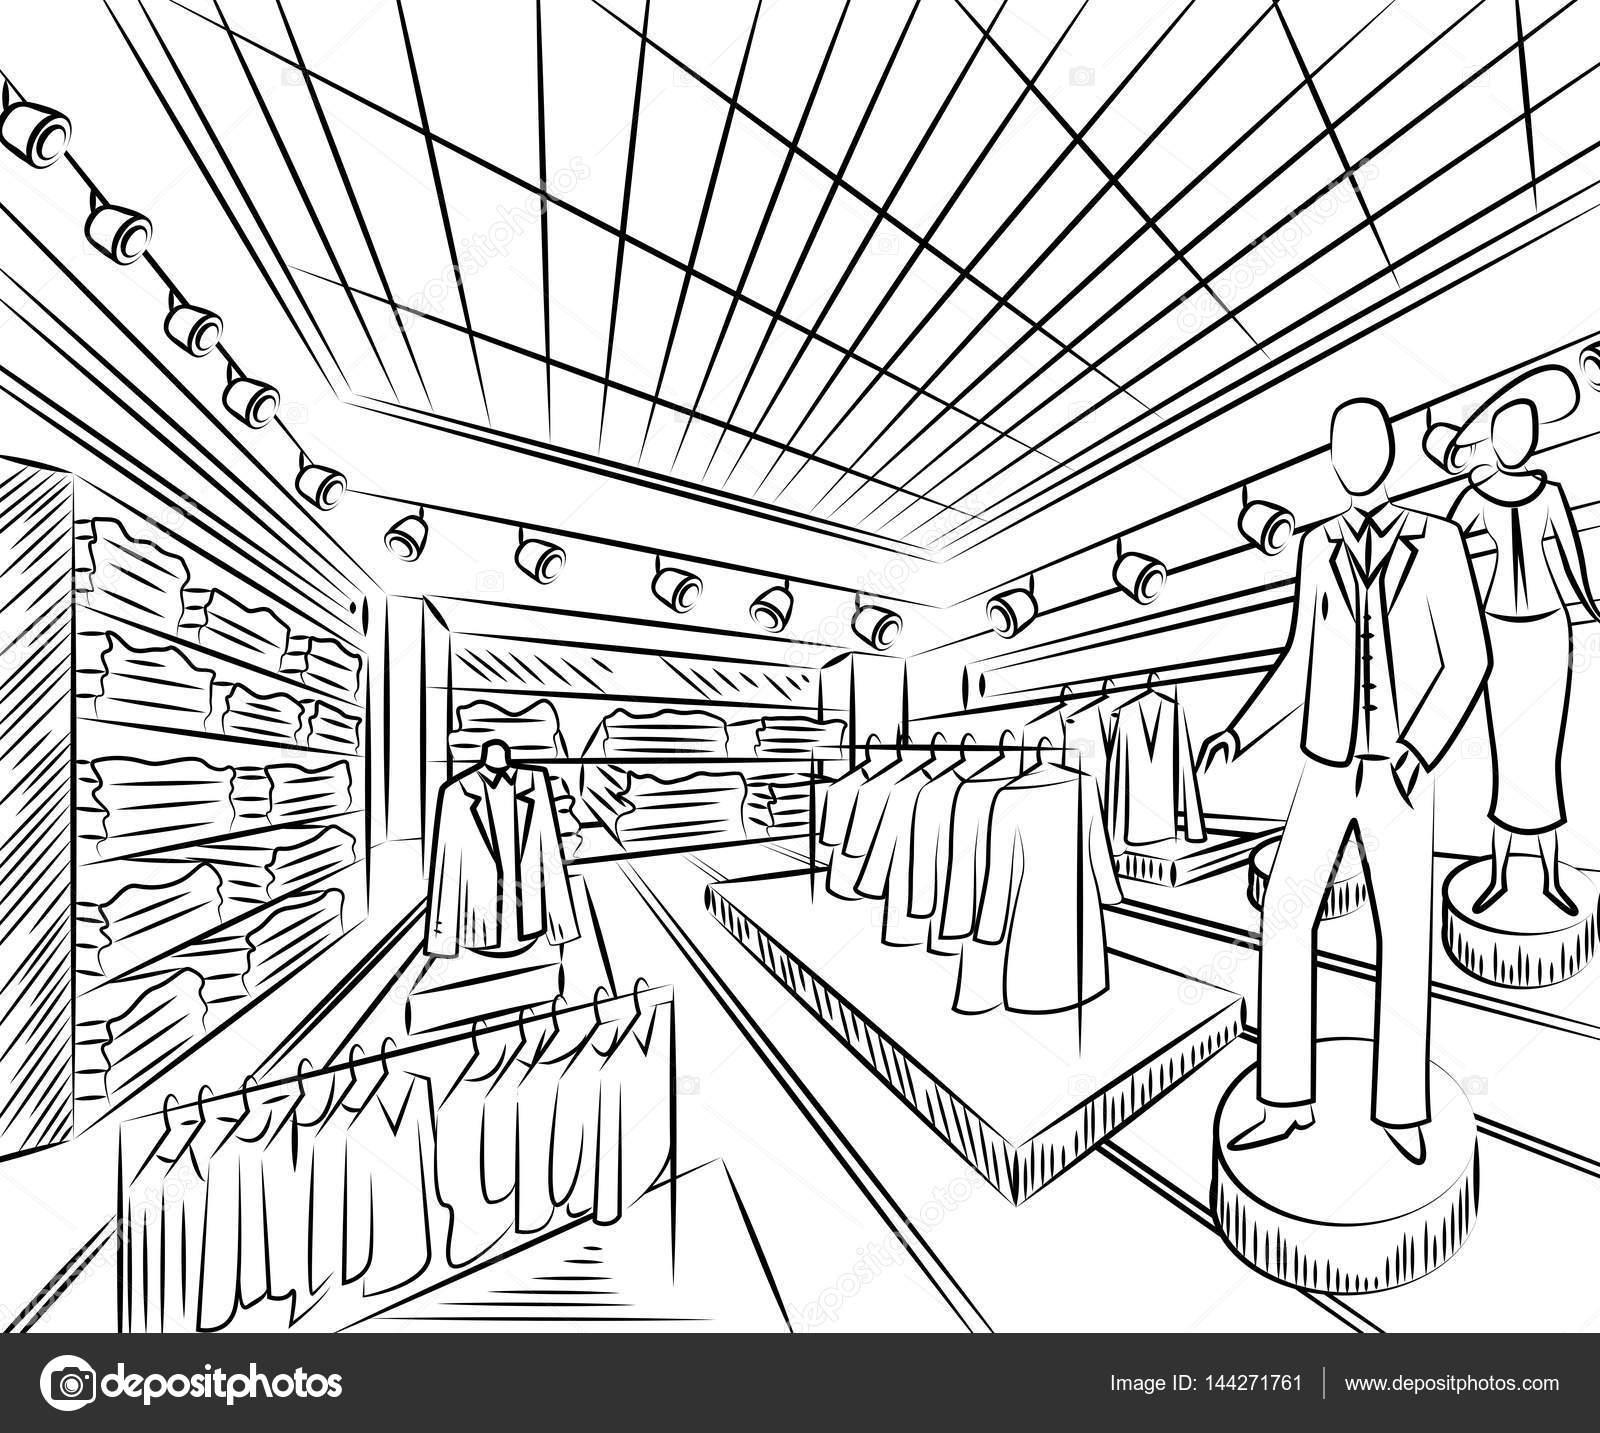 1600x1433 Fashion Store Interior Design In Sketch Style. Vintage Hand Drawn